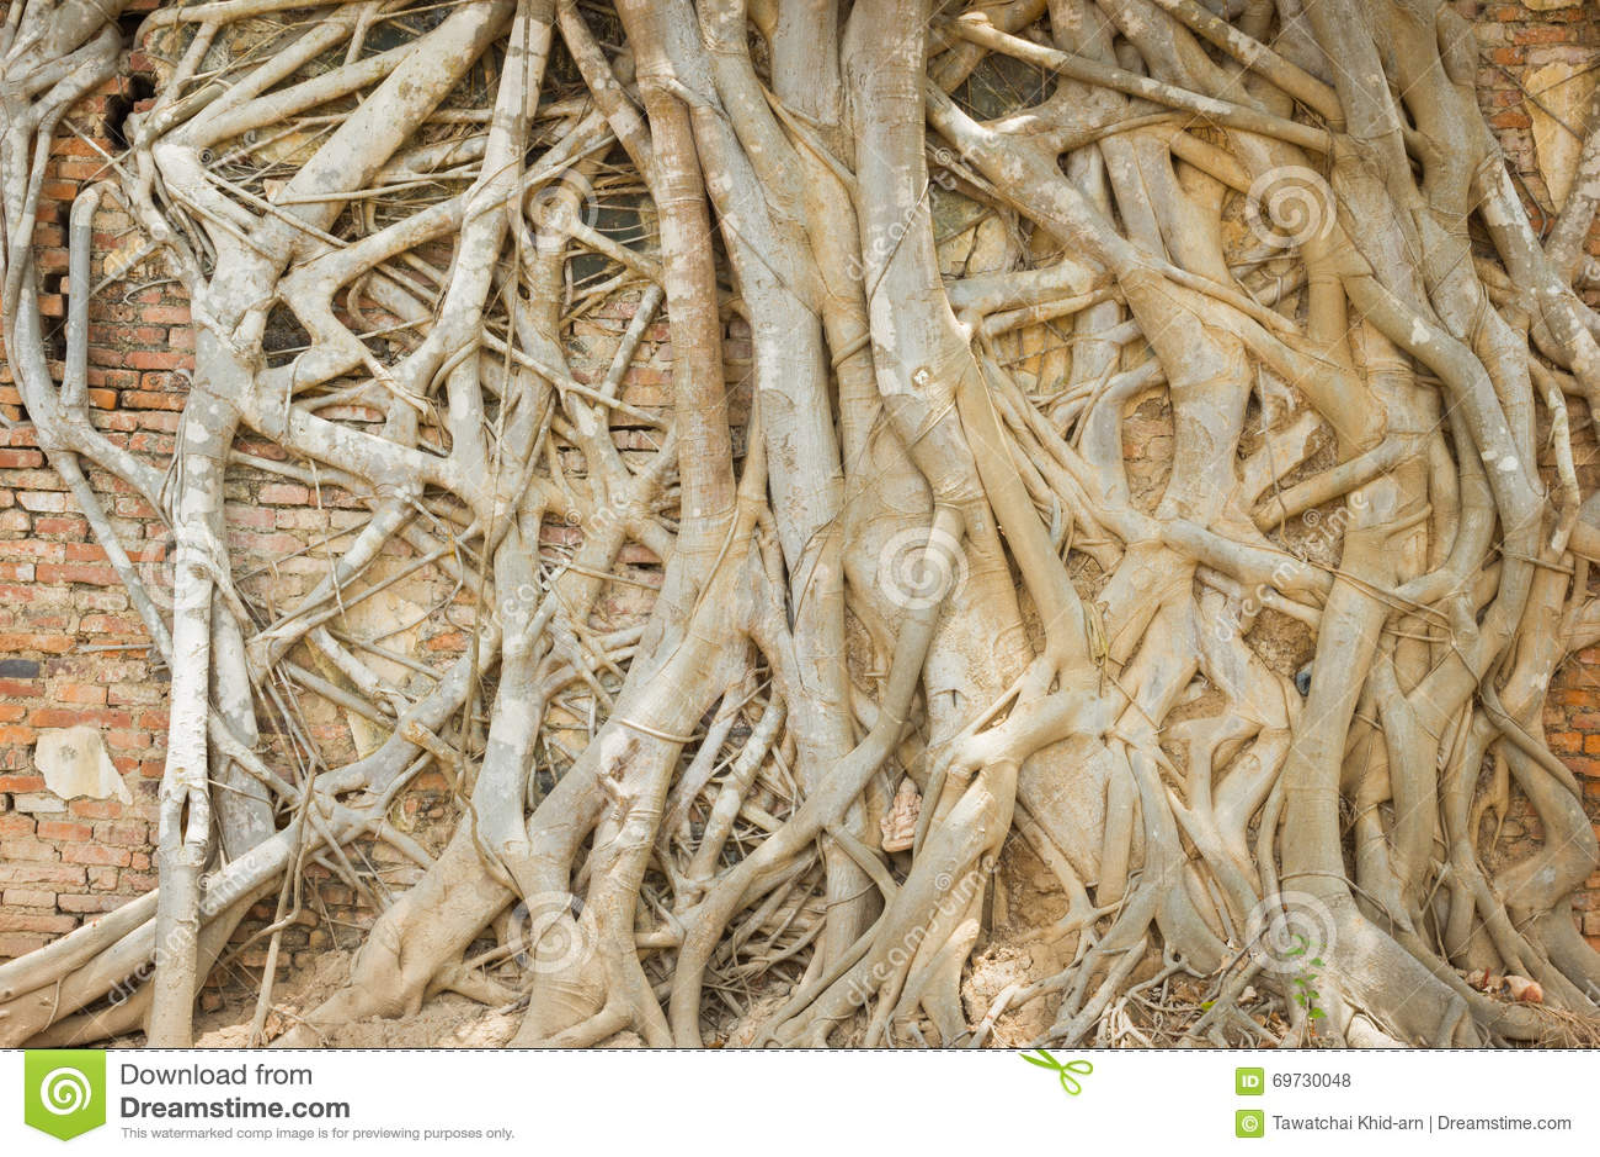 Bakstenen Binnenmuur Behandelen : Boomwortel die de oude bakstenen muur in tempel thailand